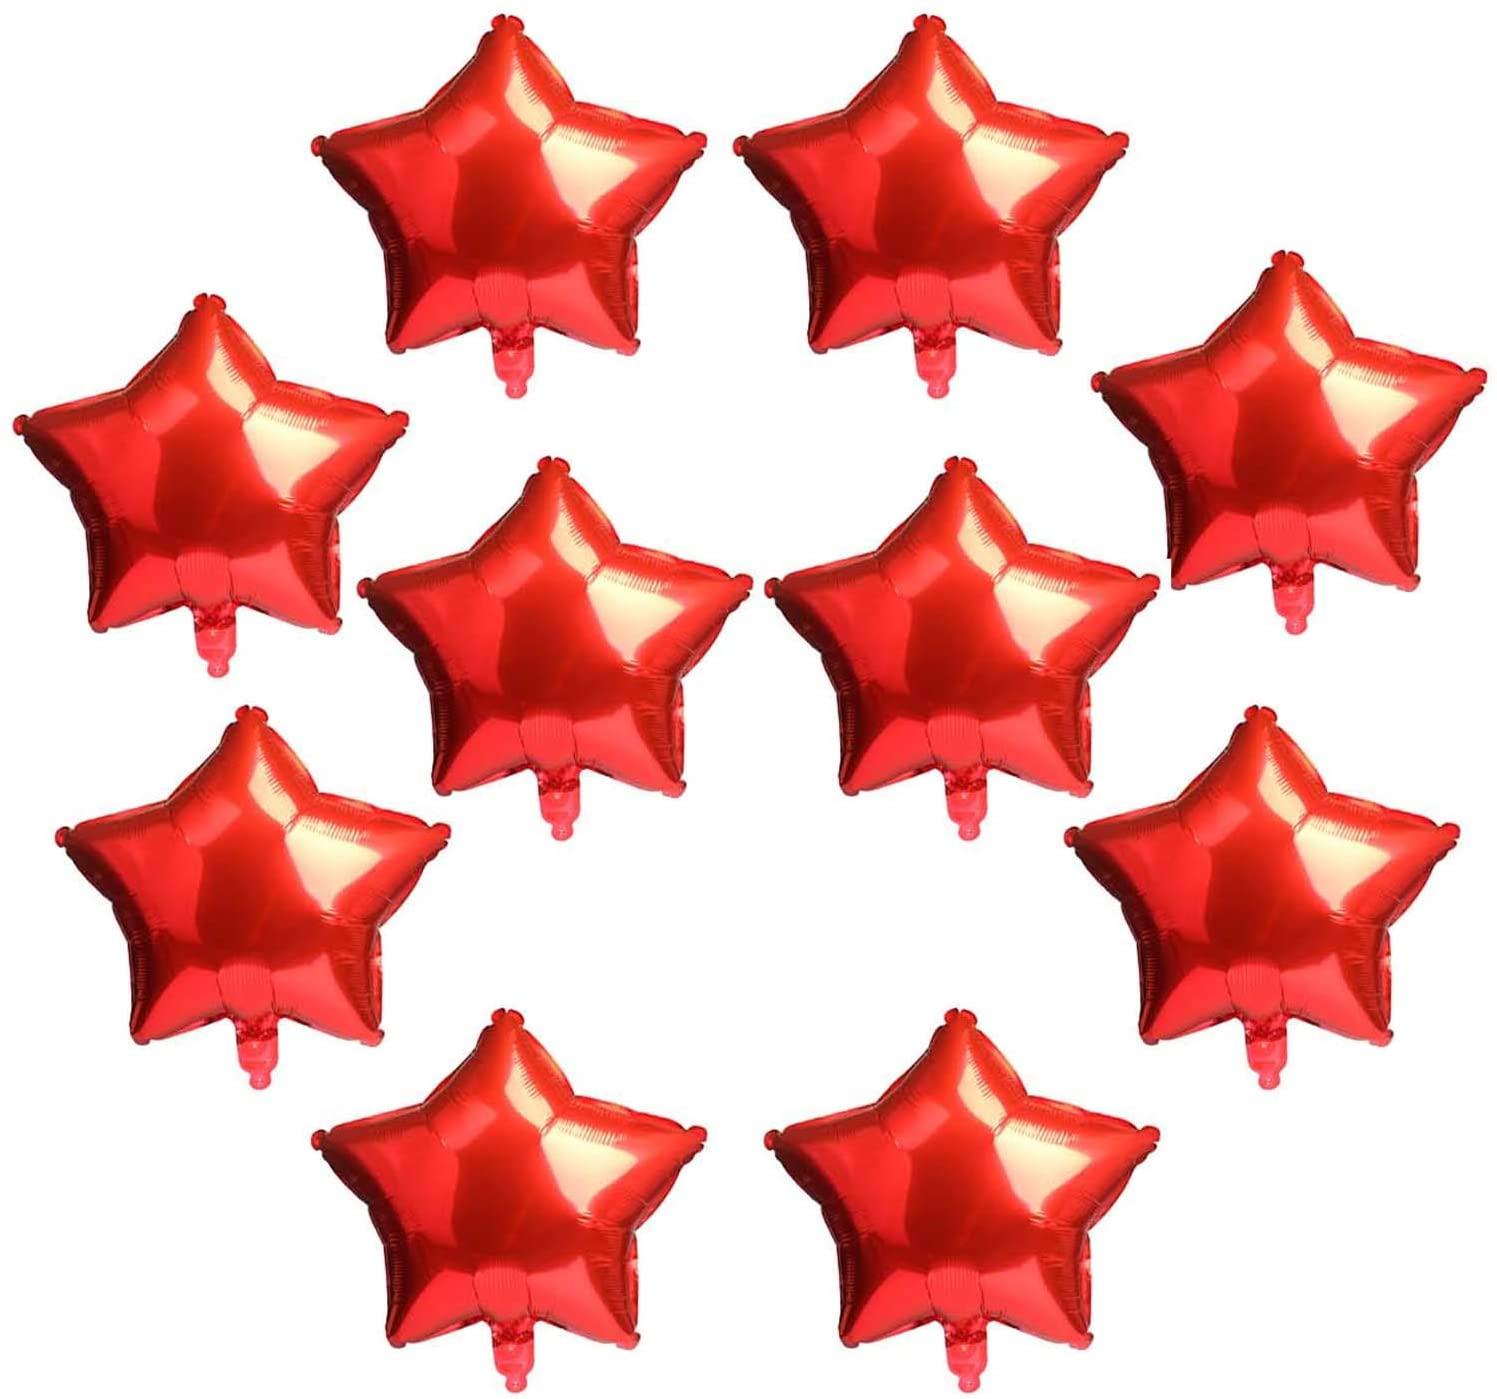 10 Pcs Star-Shaped Balloon 18 Inch Red Foil Balloon Mylar Balloon Happy Birthday Banner Balloons